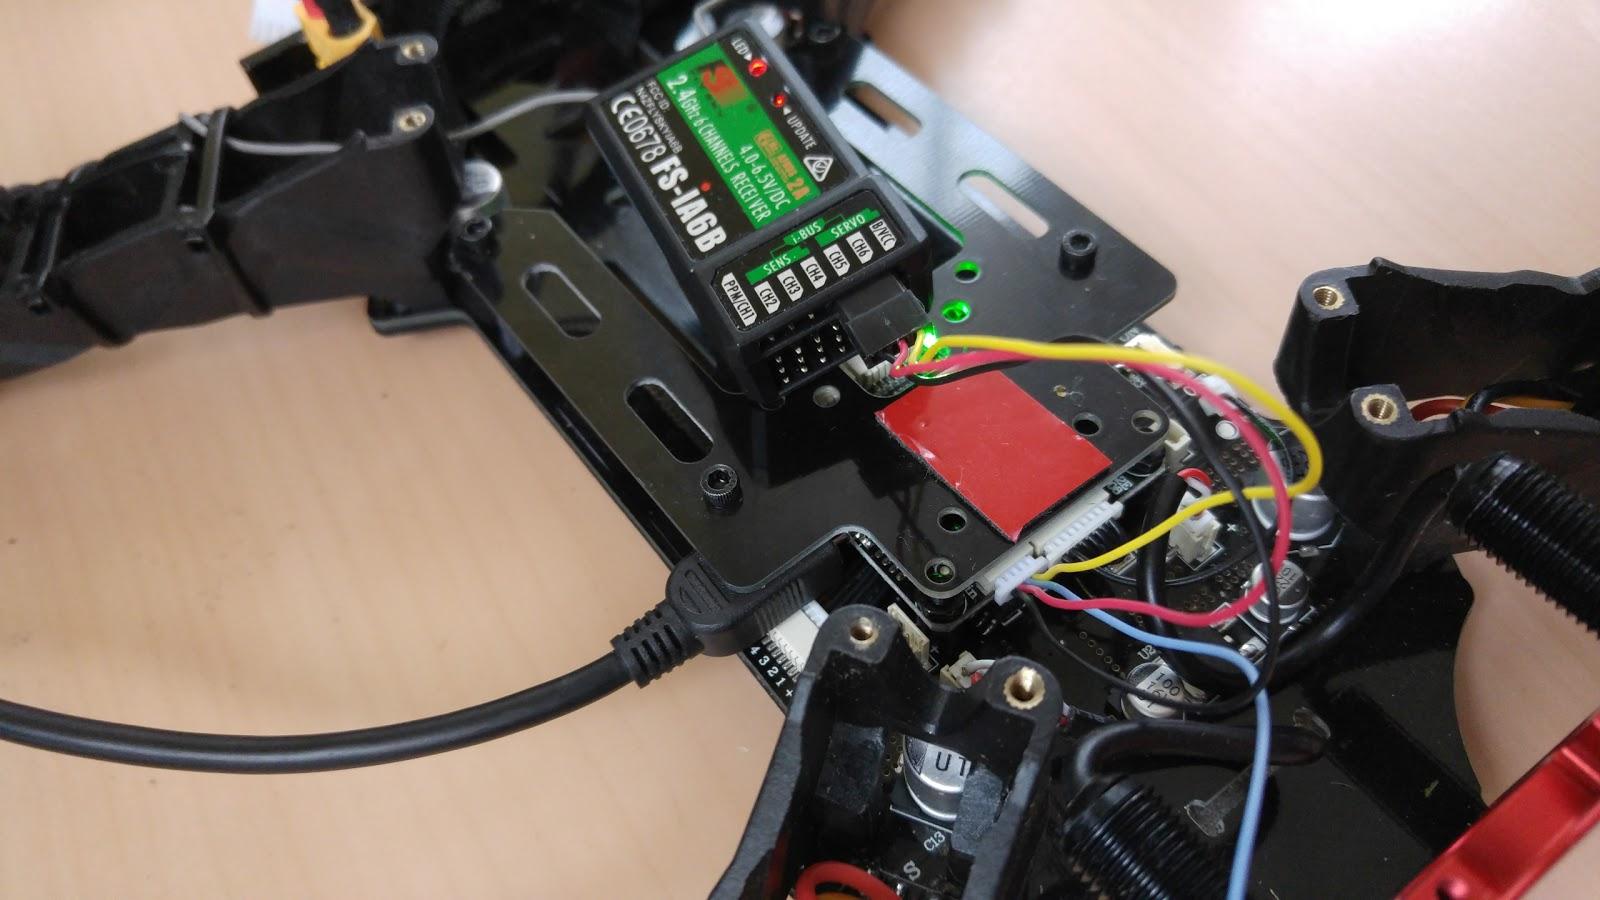 Pleasing Cc3D To X8R Wiring Diagram Wiring Diagram Wiring Cloud Hisonepsysticxongrecoveryedborg